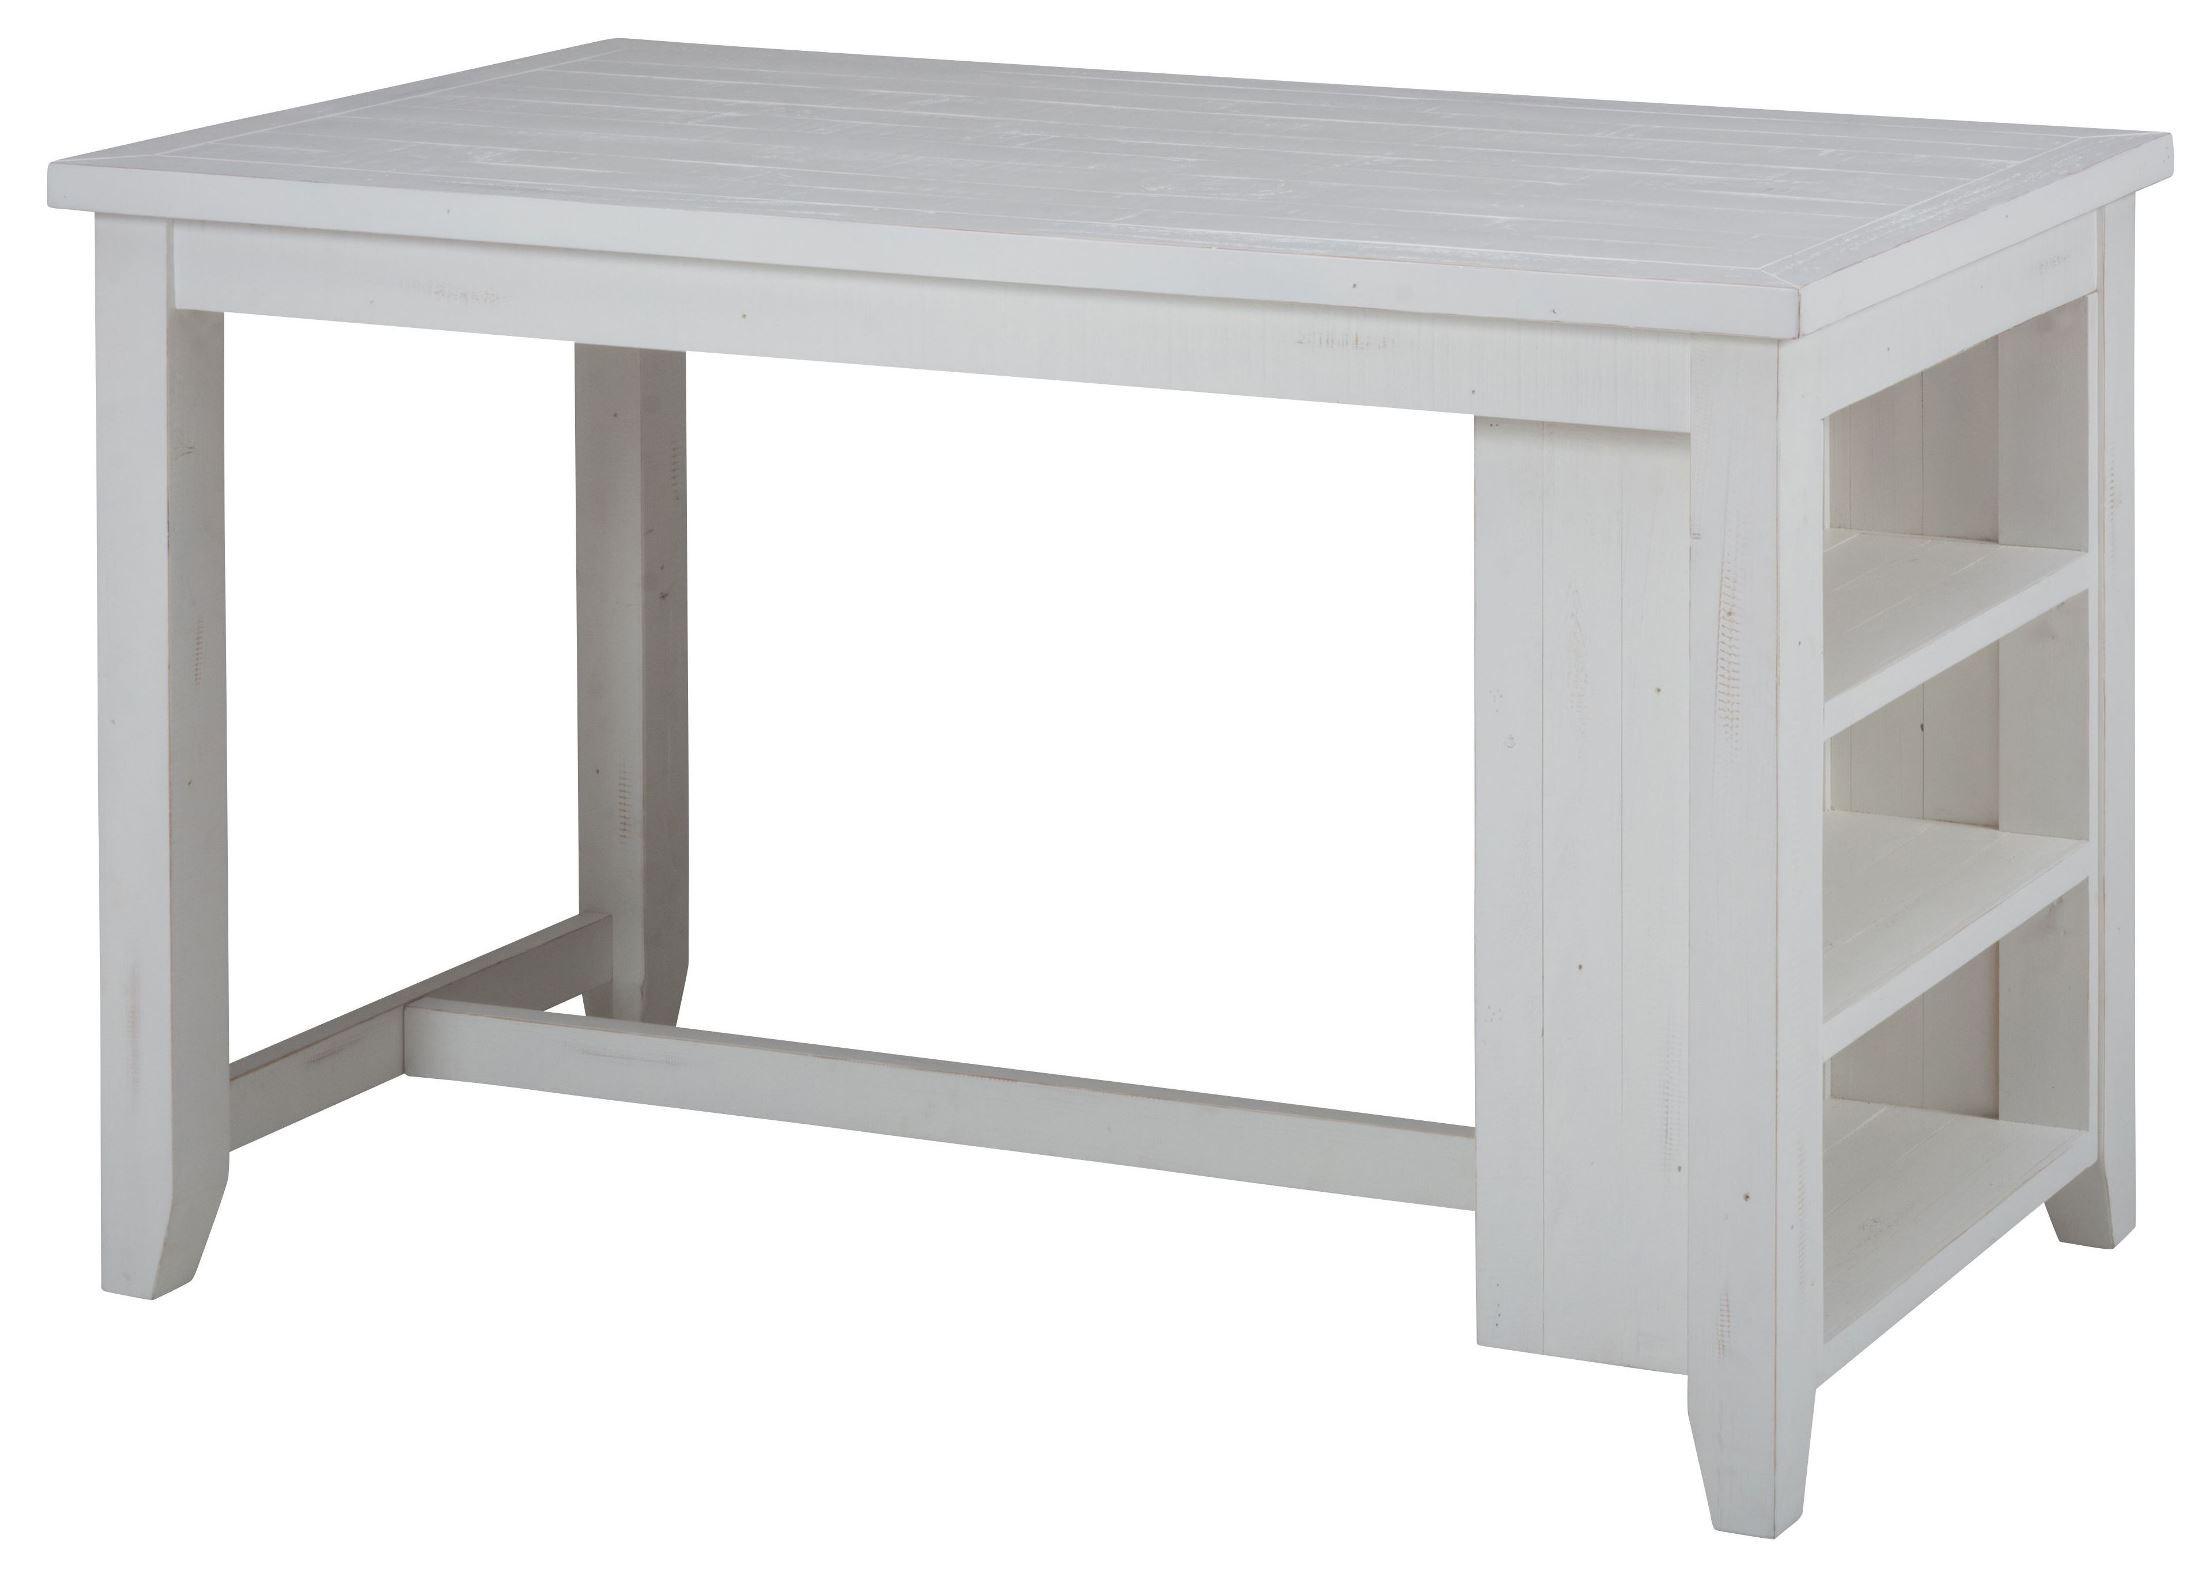 Madaket Reclaimed Pine Shelf Storage Counter Height Dining Table 647 60 Jofran